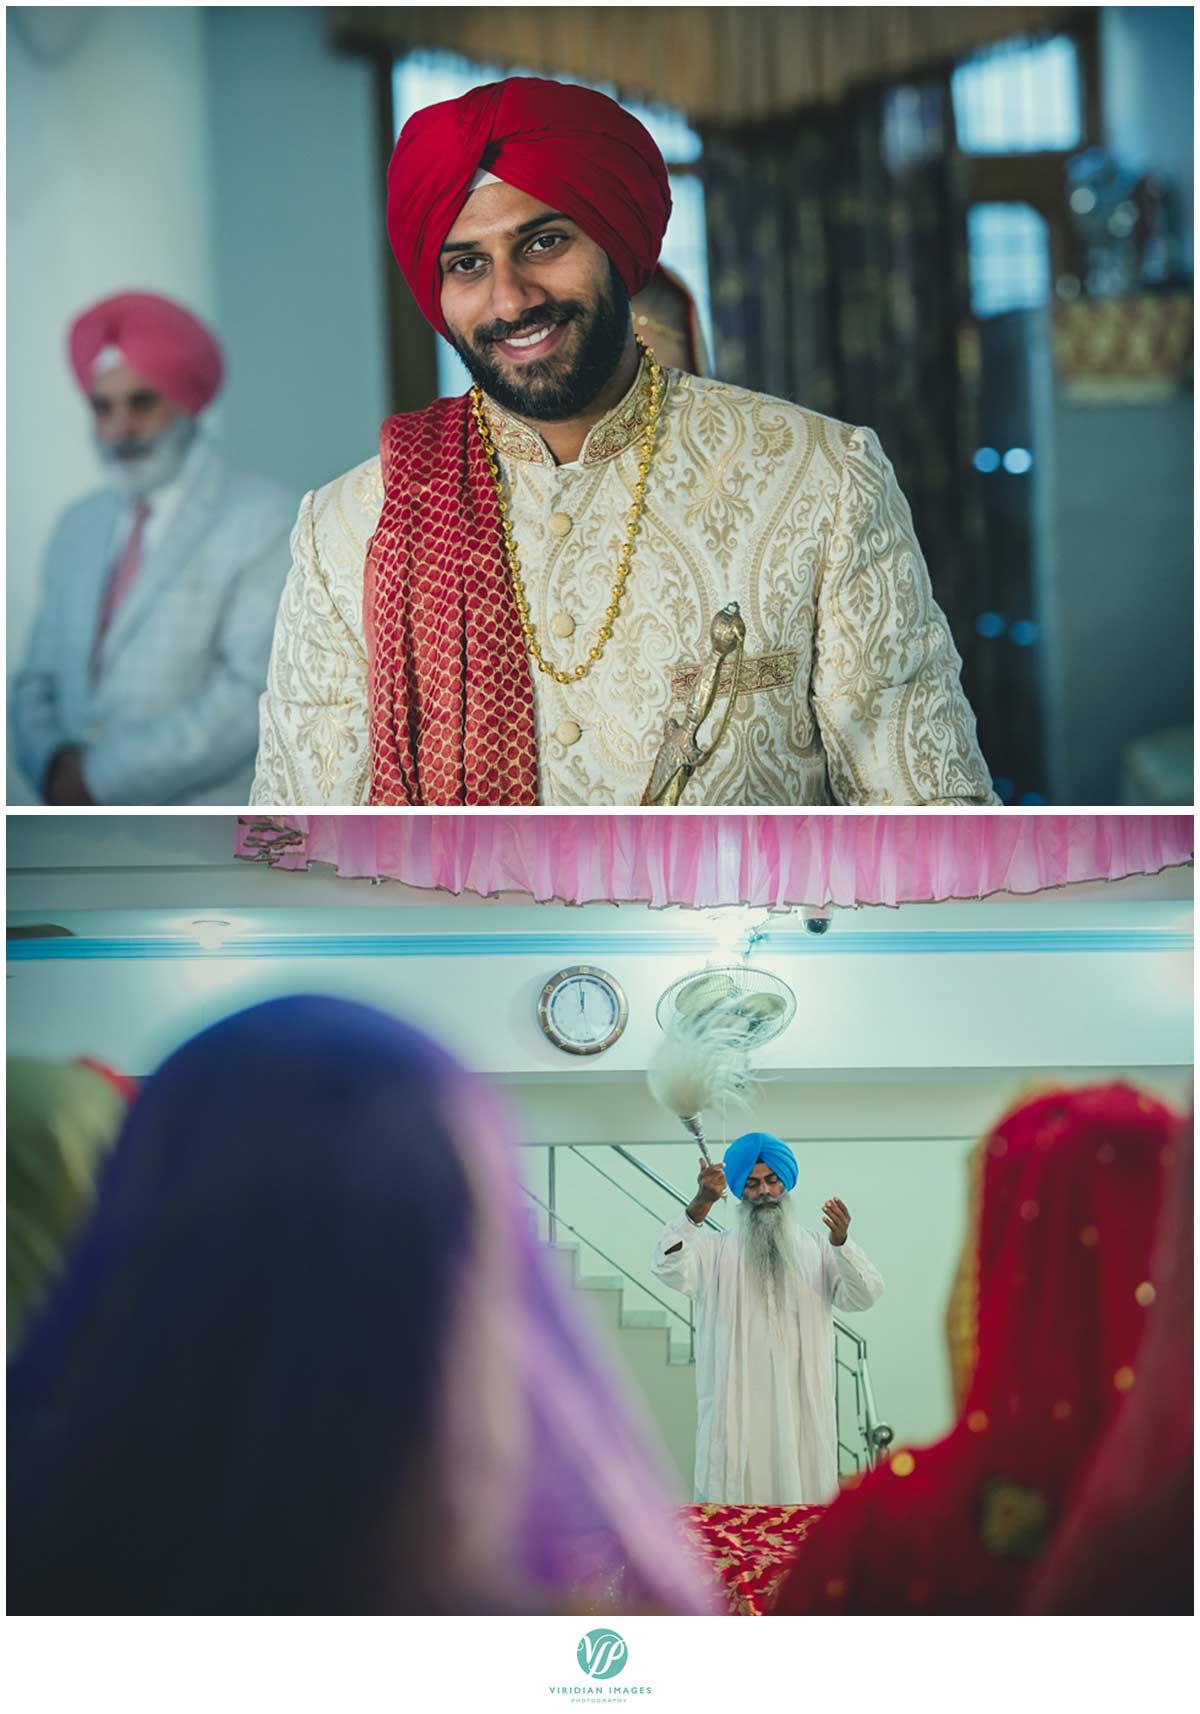 India_Chandigarh_Wedding_Viridian_Images_Photography_poto_26